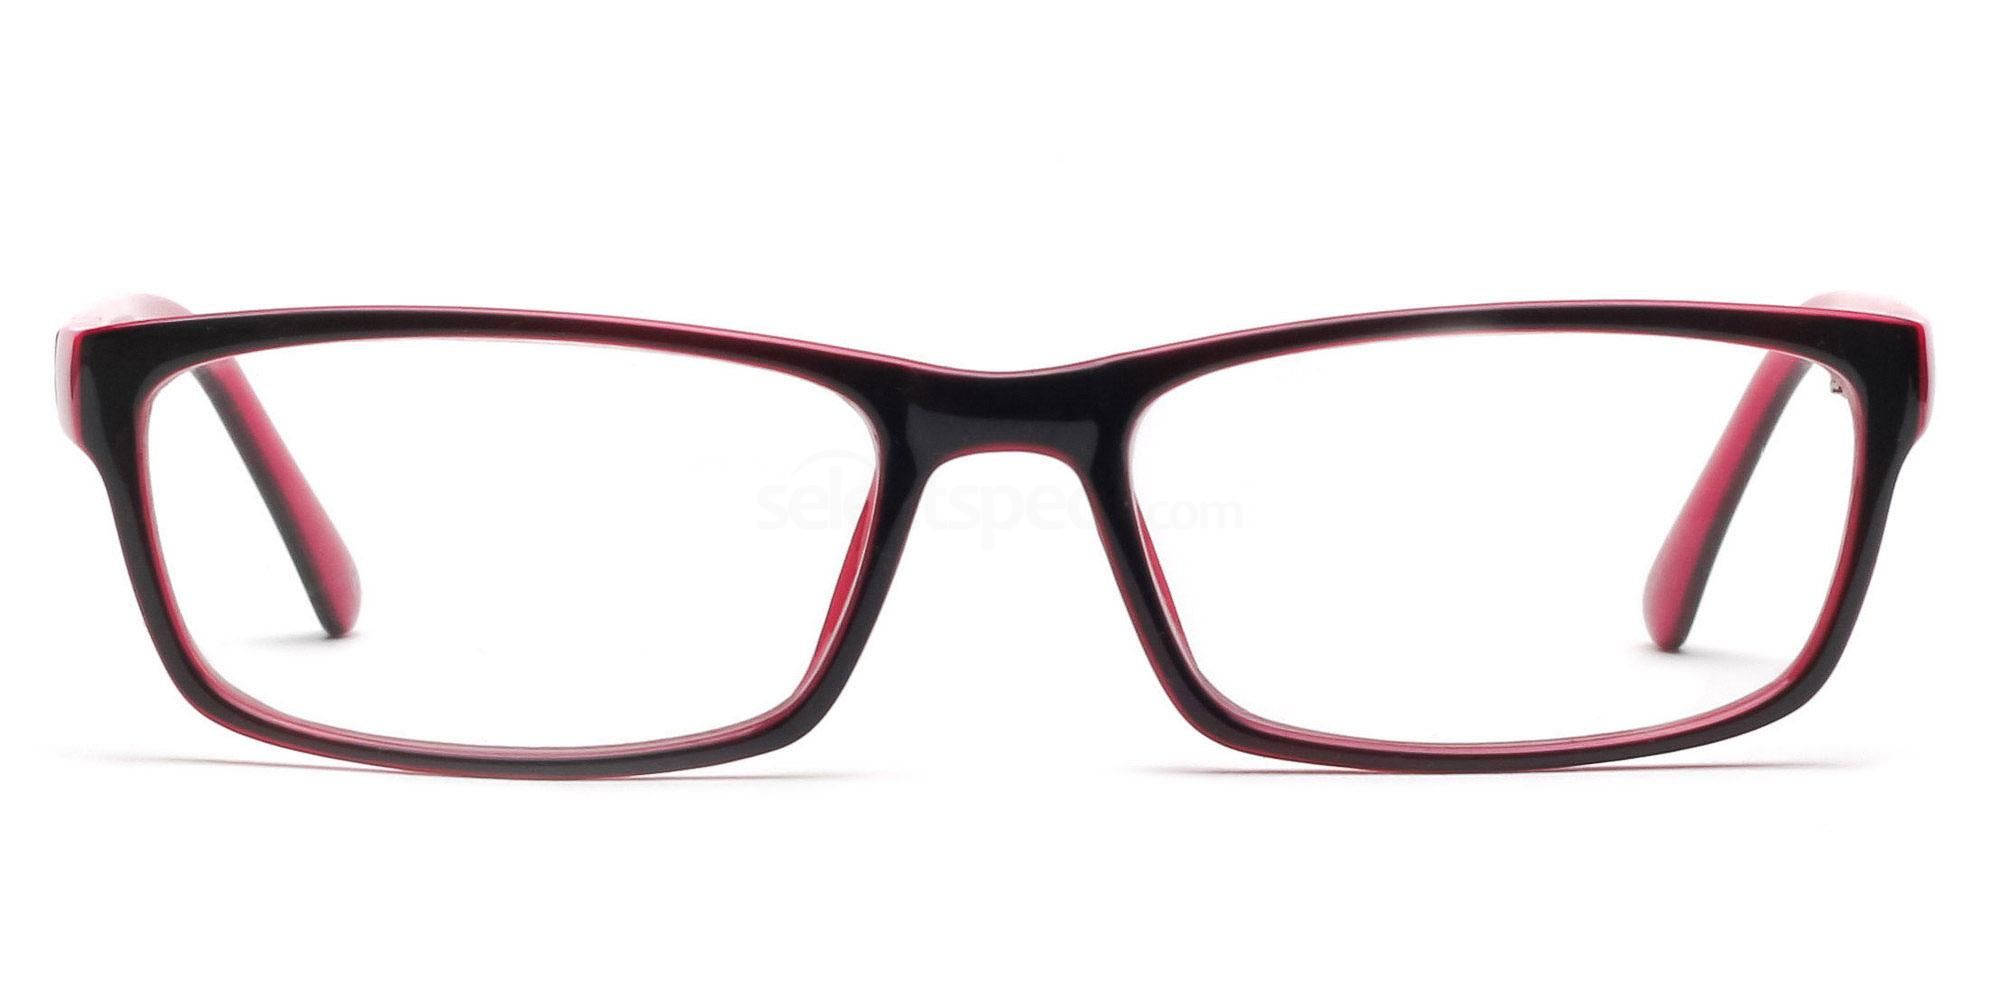 Pink and Black 2426 - Black and Pink Glasses, Savannah